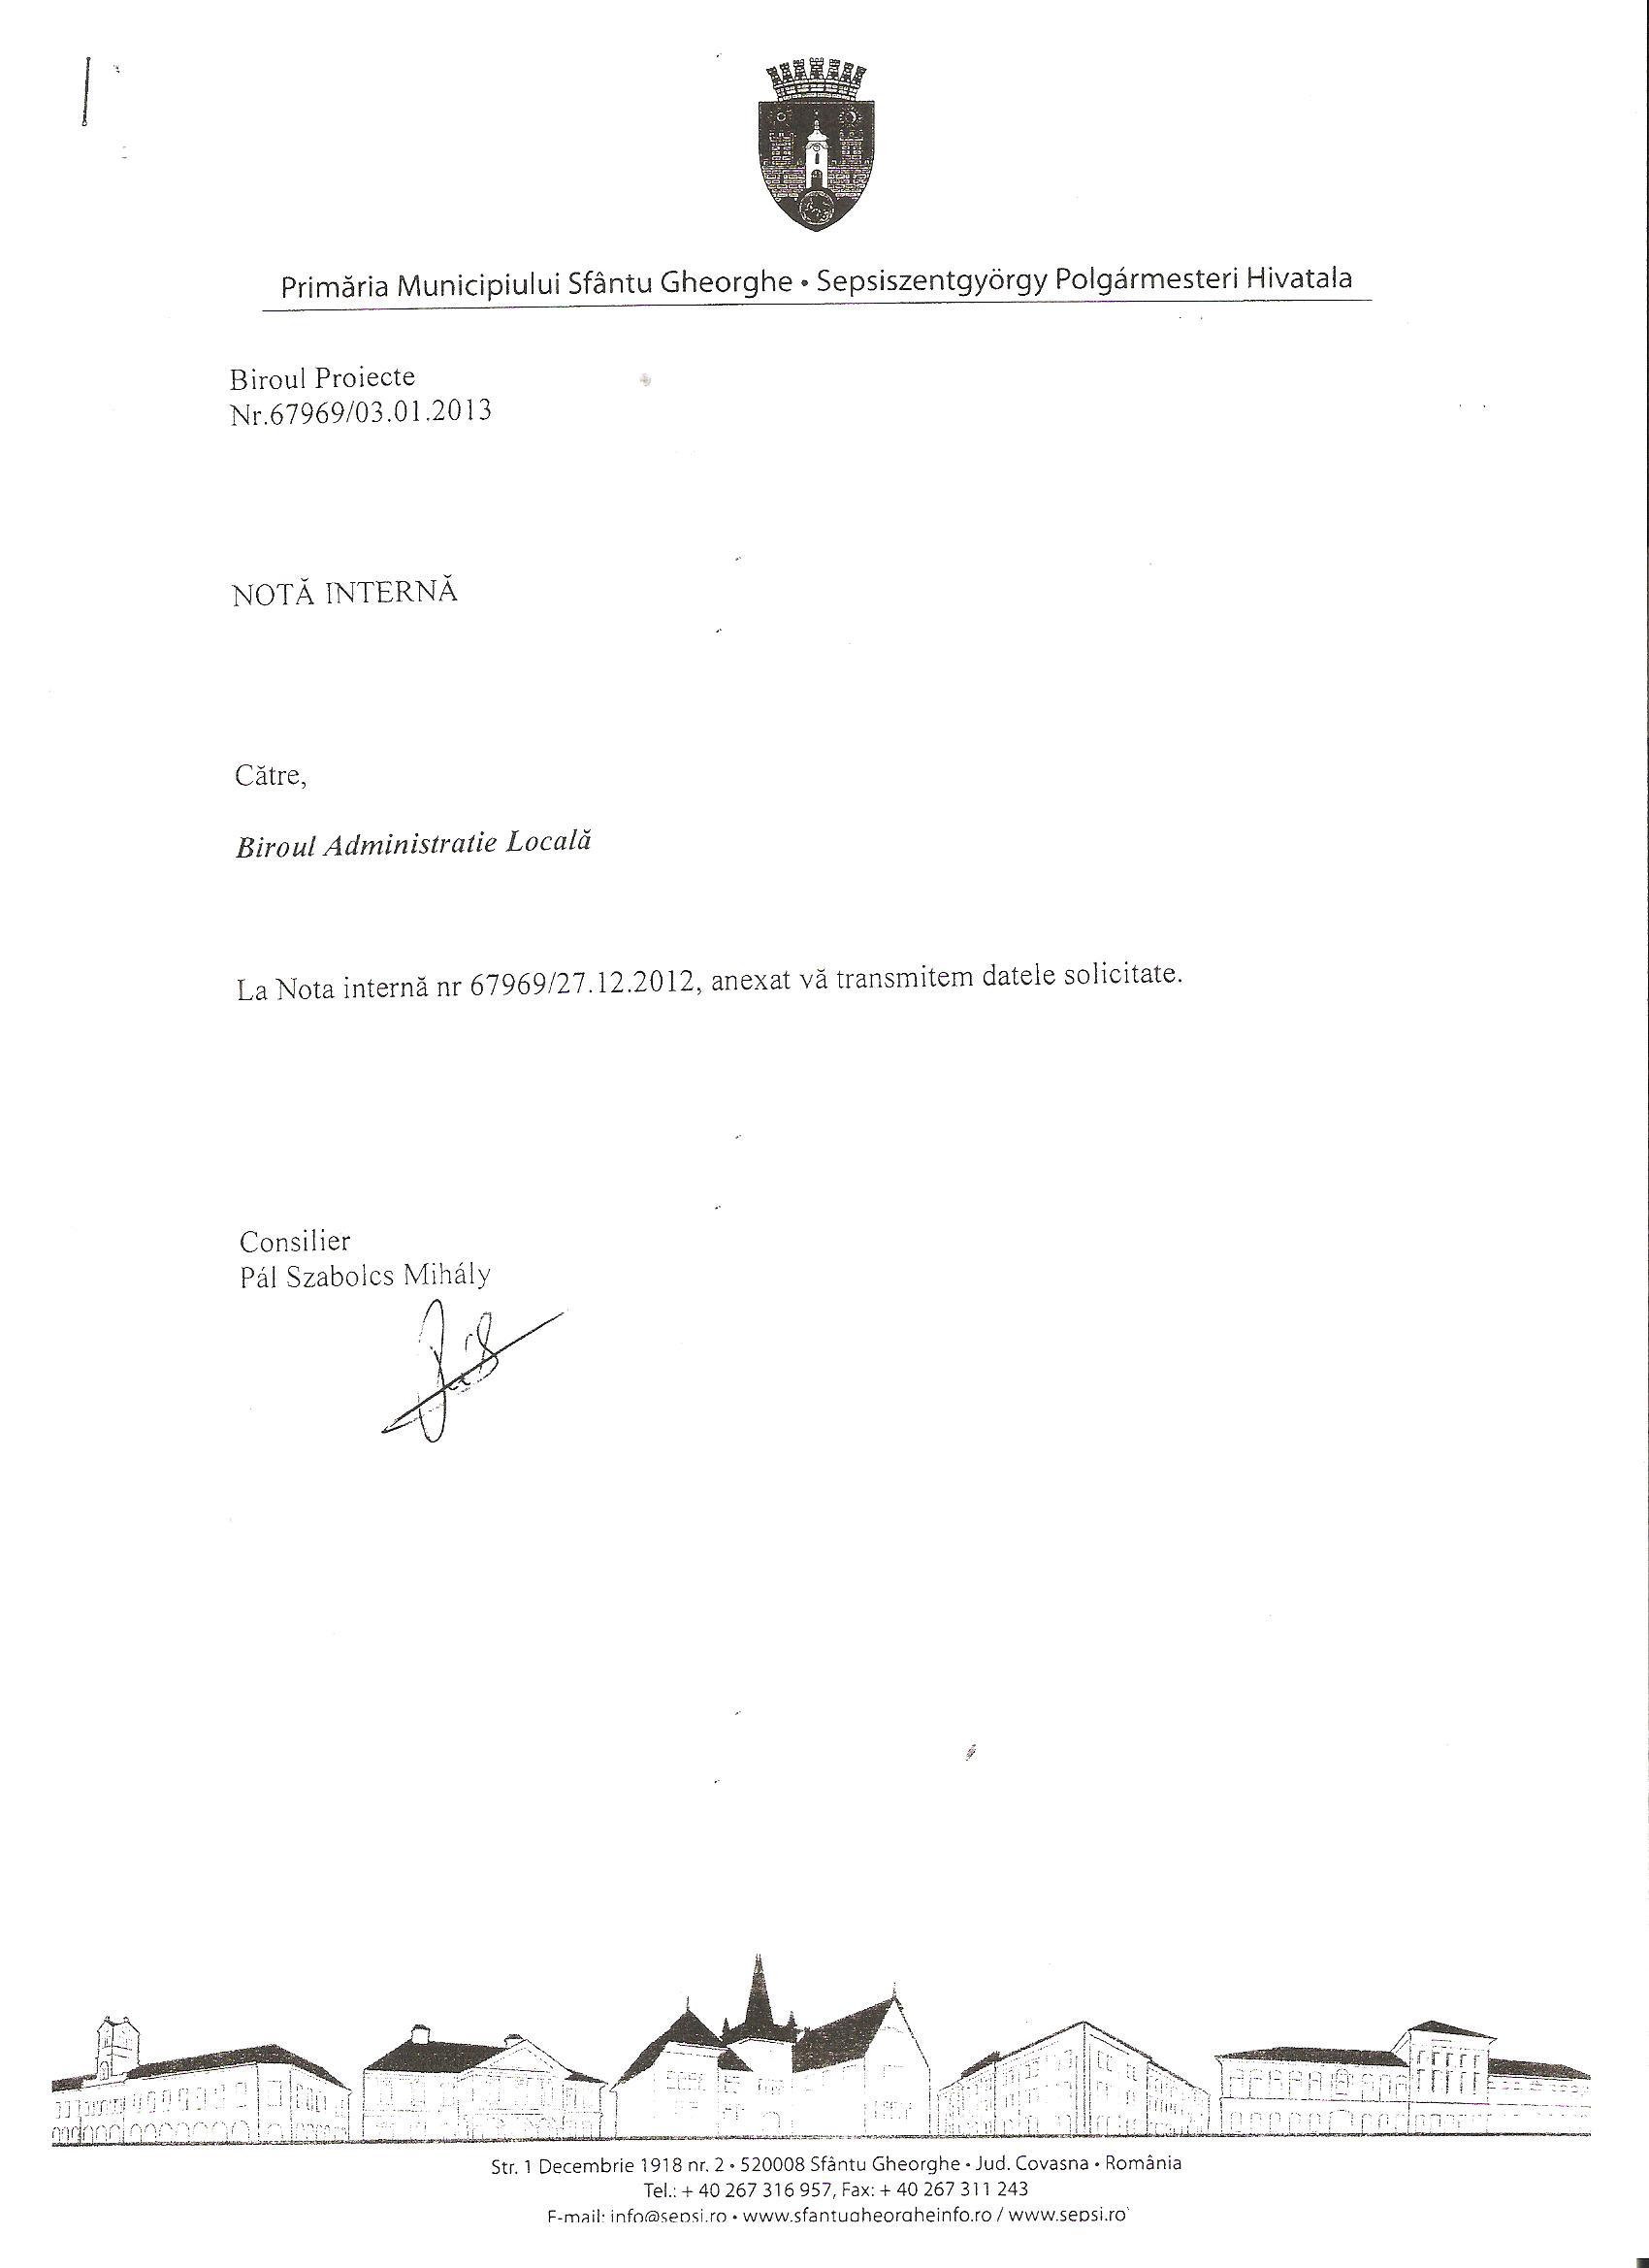 Primăria Sfântu Gheorghe SC Producție Prod AX SRL fonduri europene 1